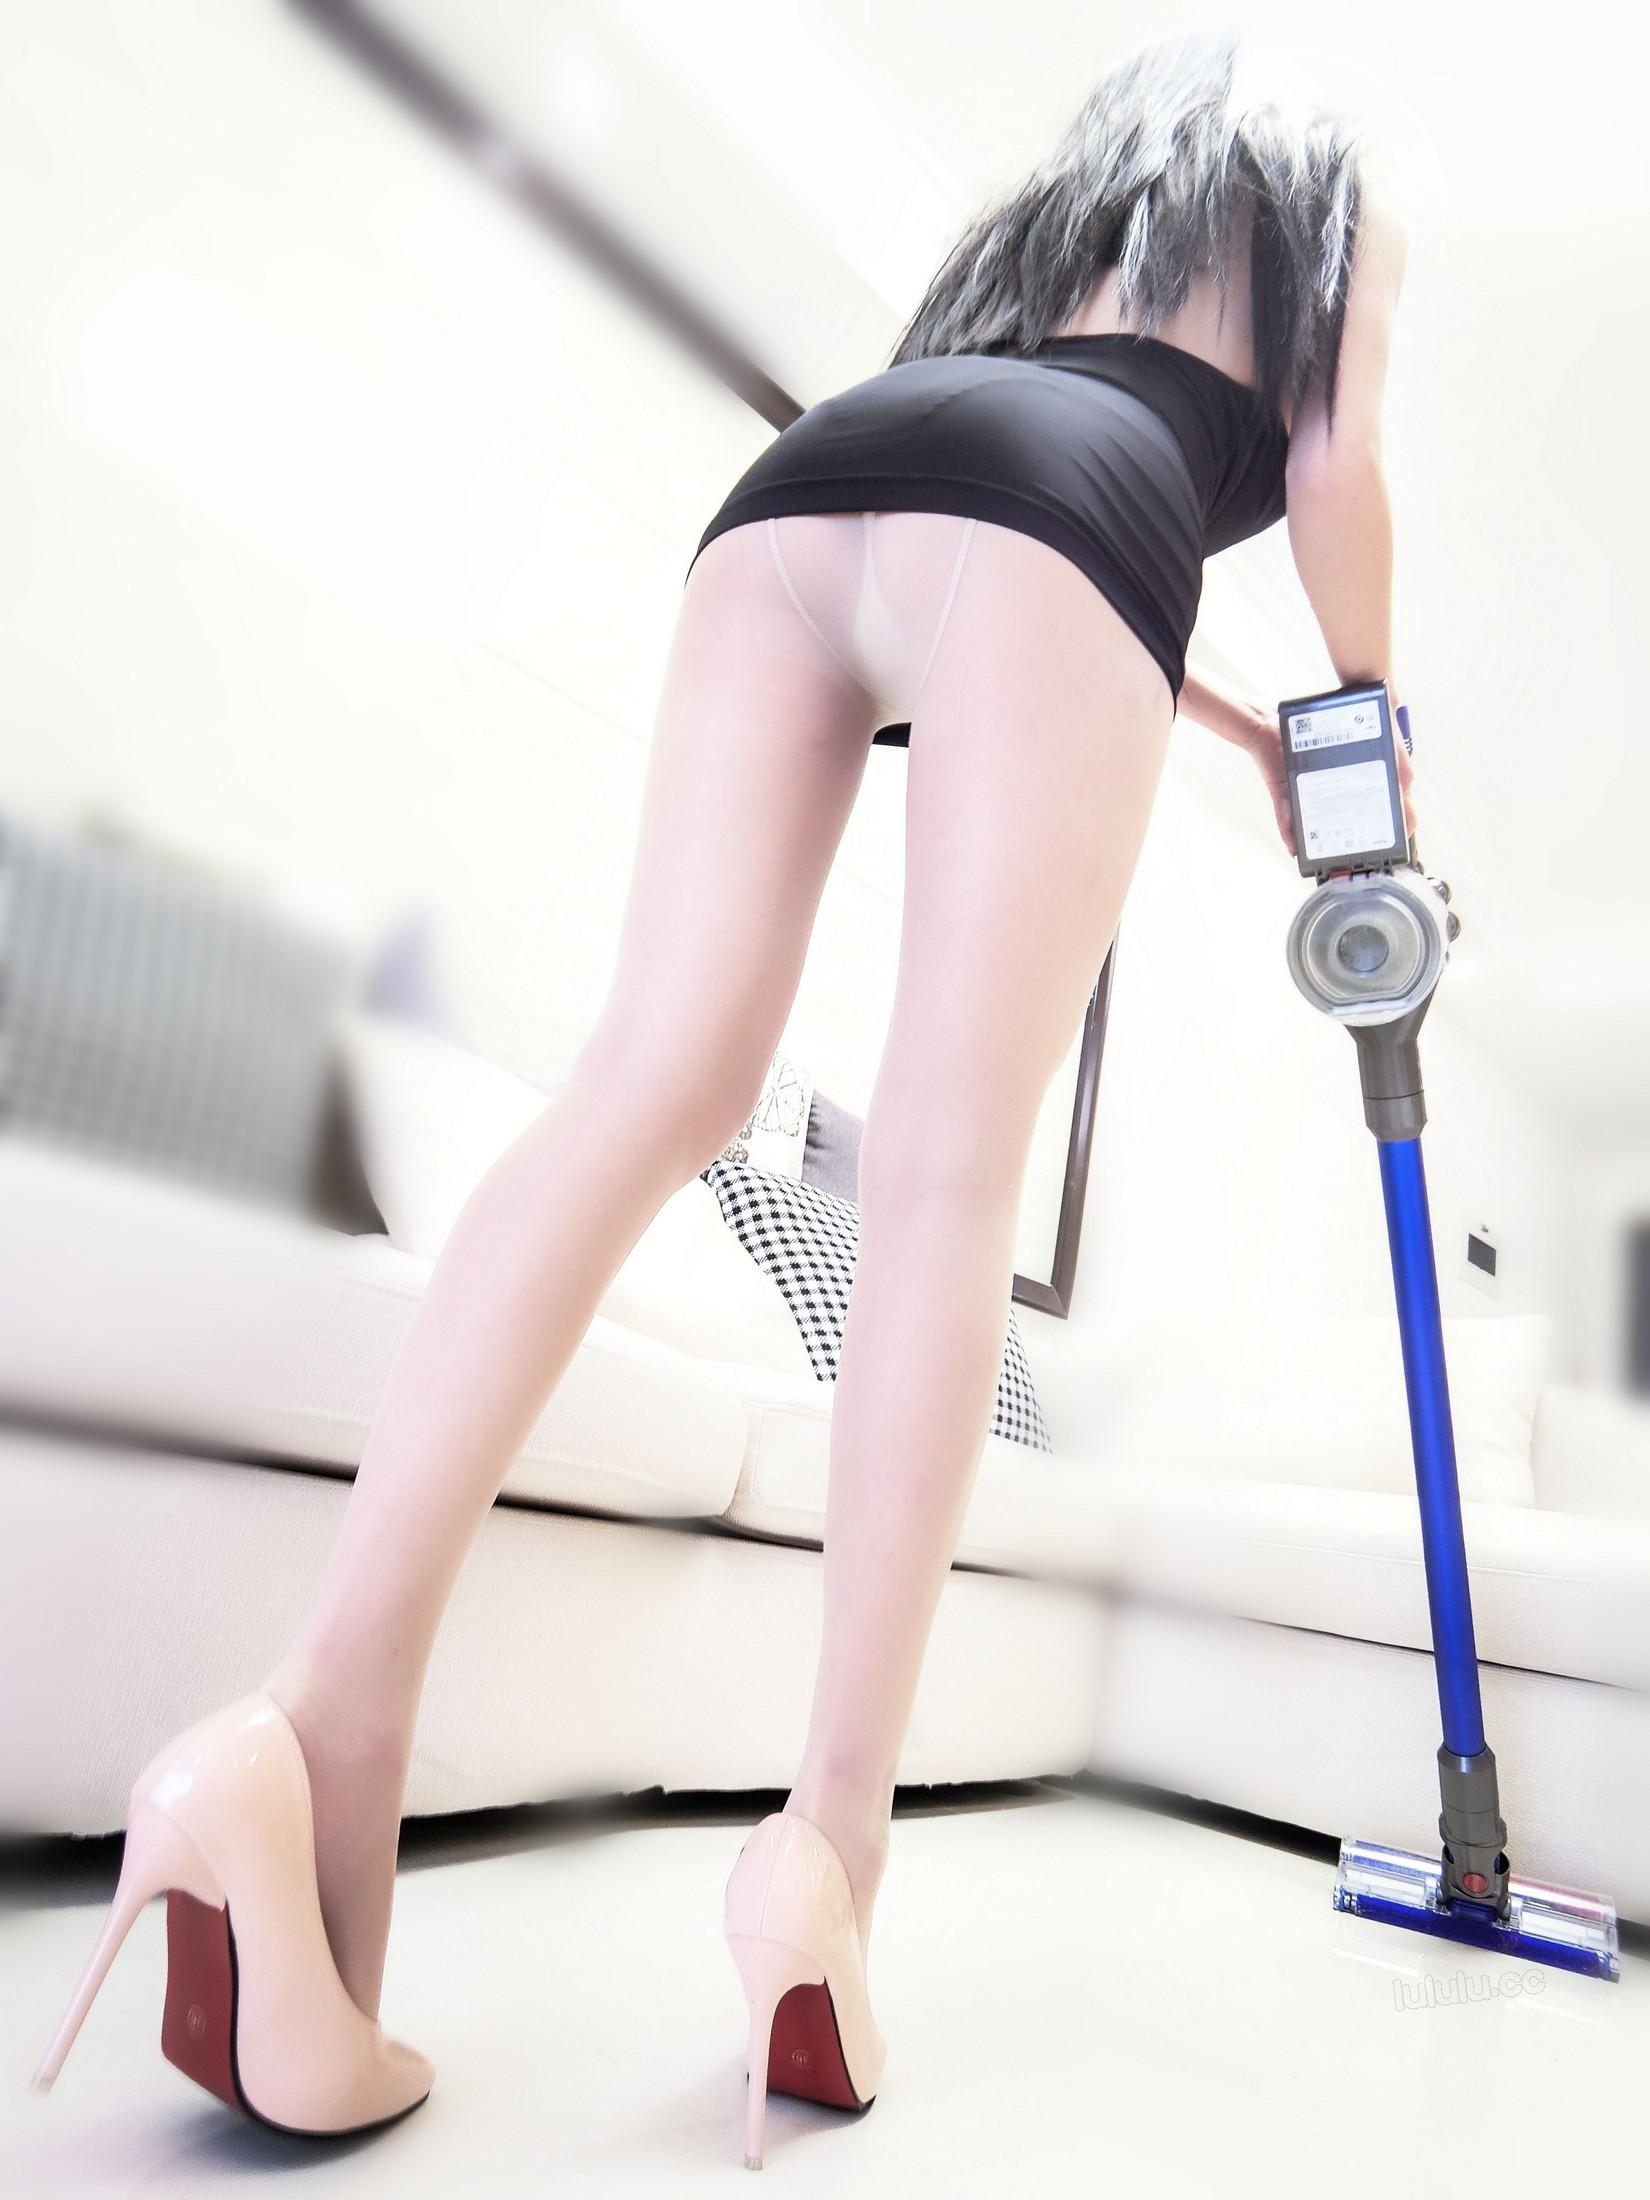 [cosplay] MaSusu - Sexy black skirt cleaning 005